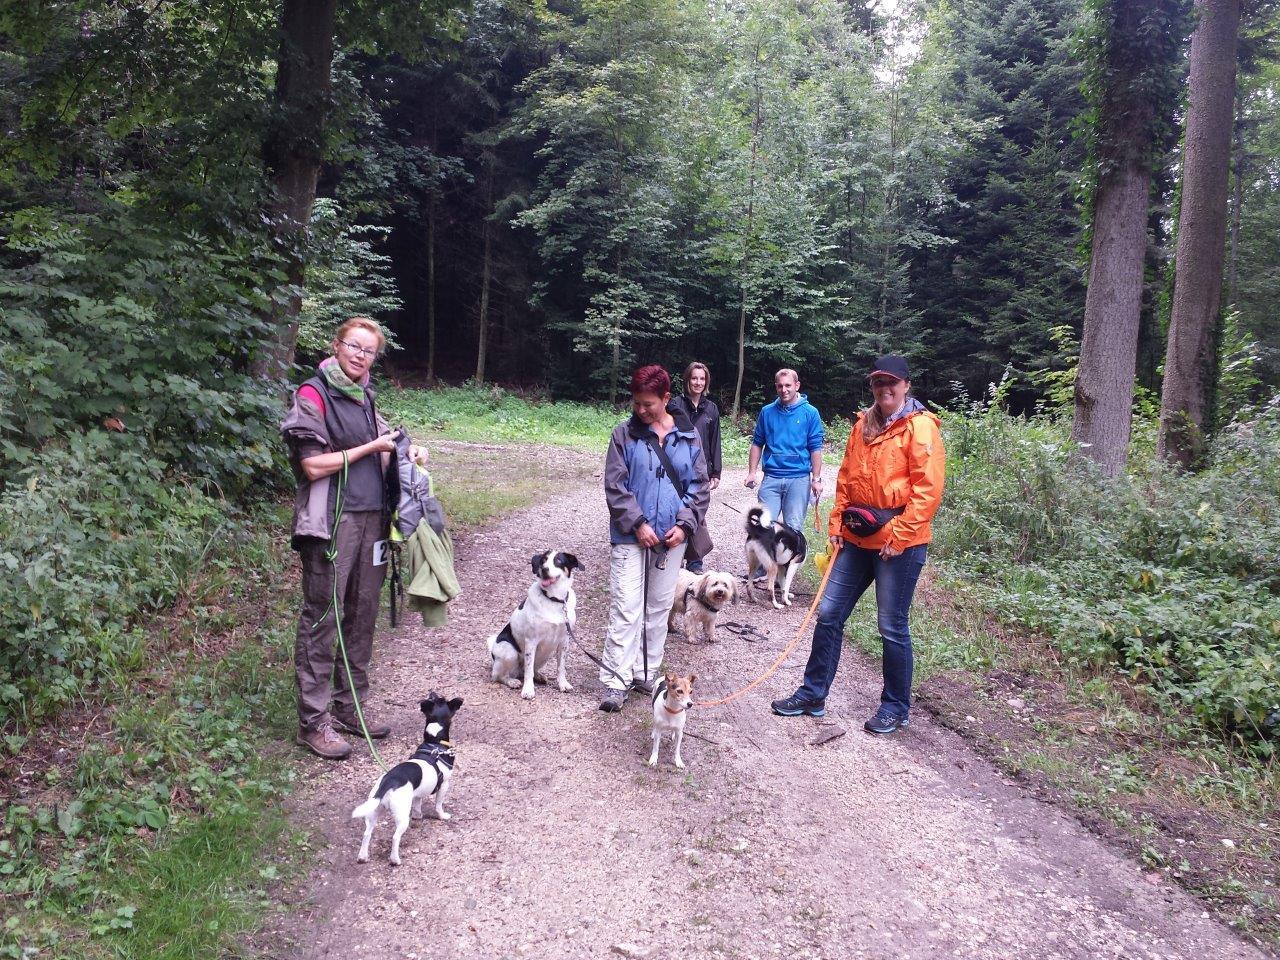 Micaela mit Lucy, Maya und Birgit, Boncuk, Anja mit Lilou & Flo, Joya & Marlen